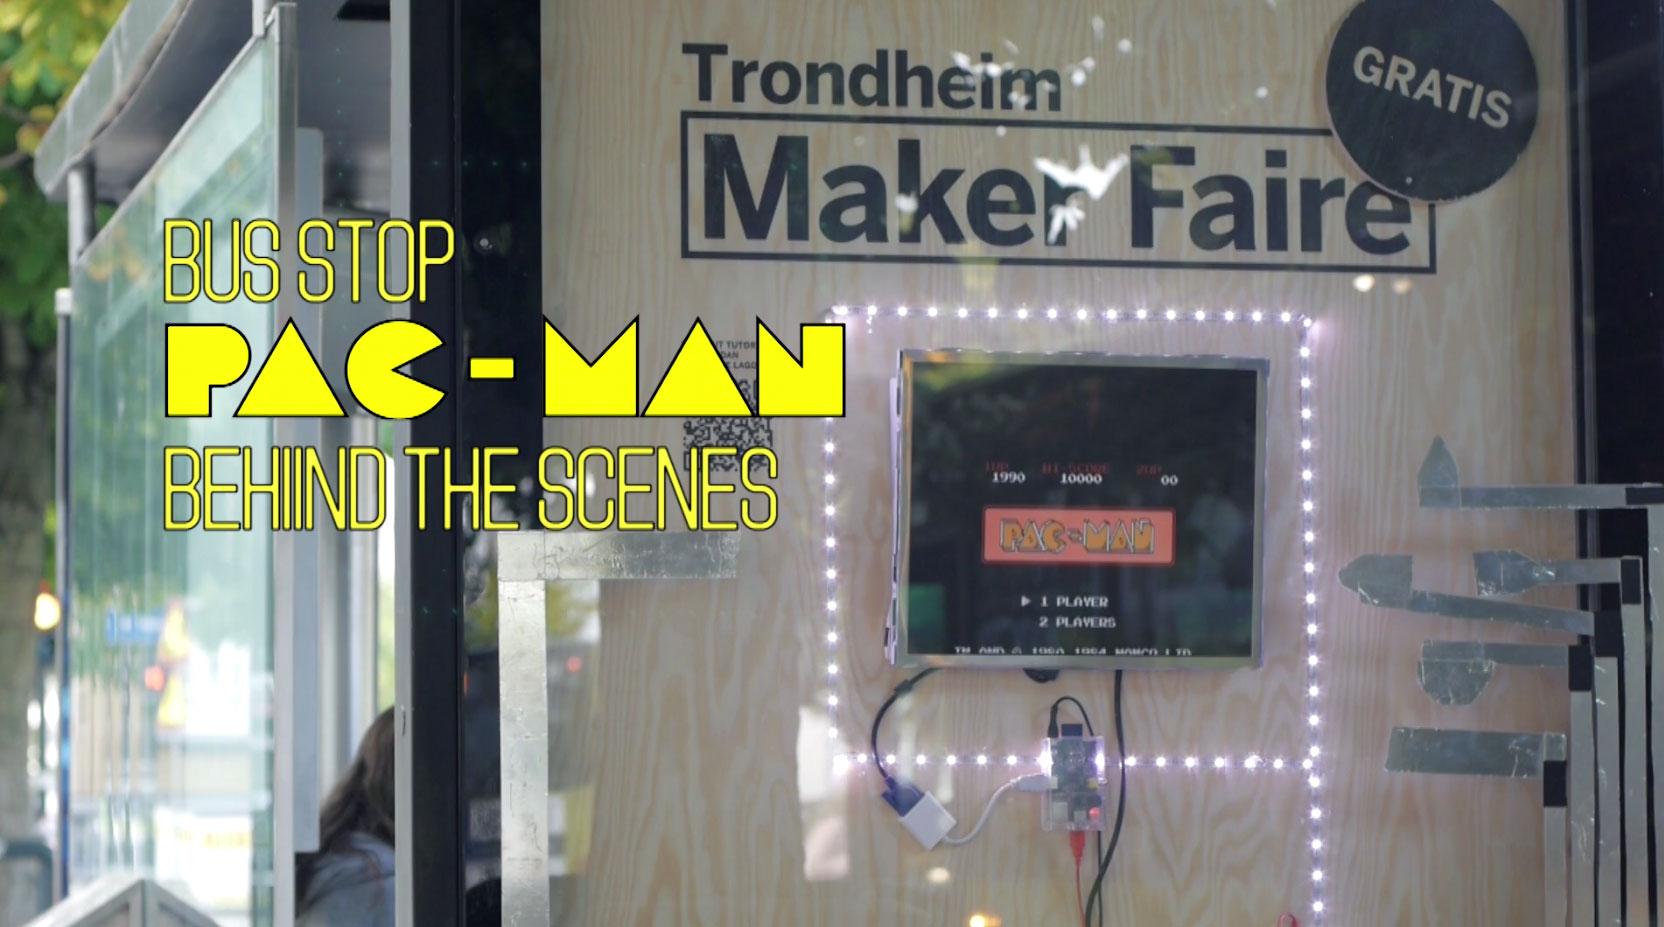 Raspberry Pi and MaKey MaKey Power Bus Stop Pac-Man